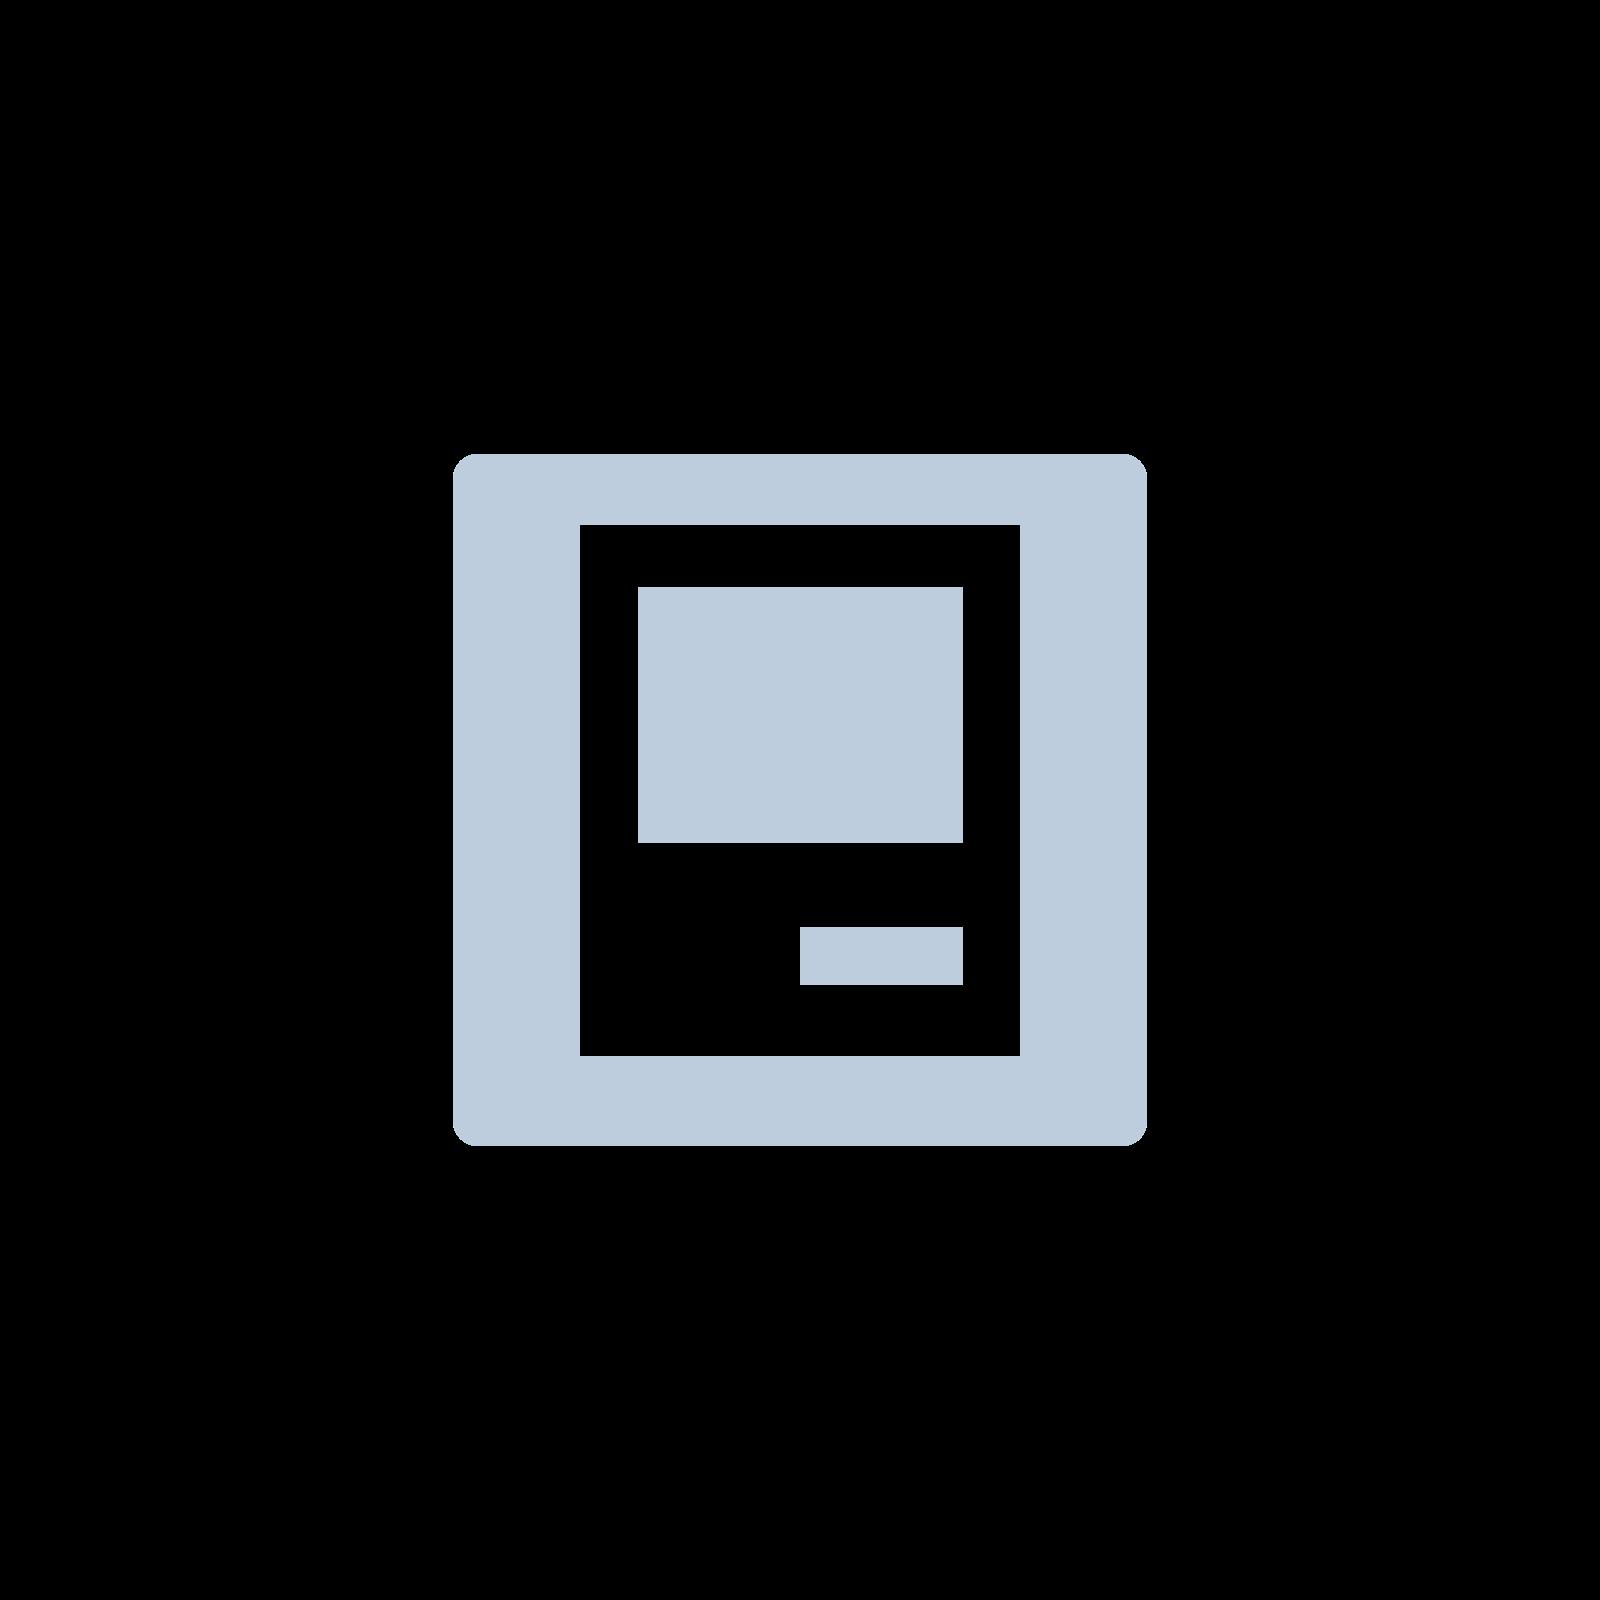 iPad mini (1. Generation) 32GB Wi-Fi + Cellular Space Grau